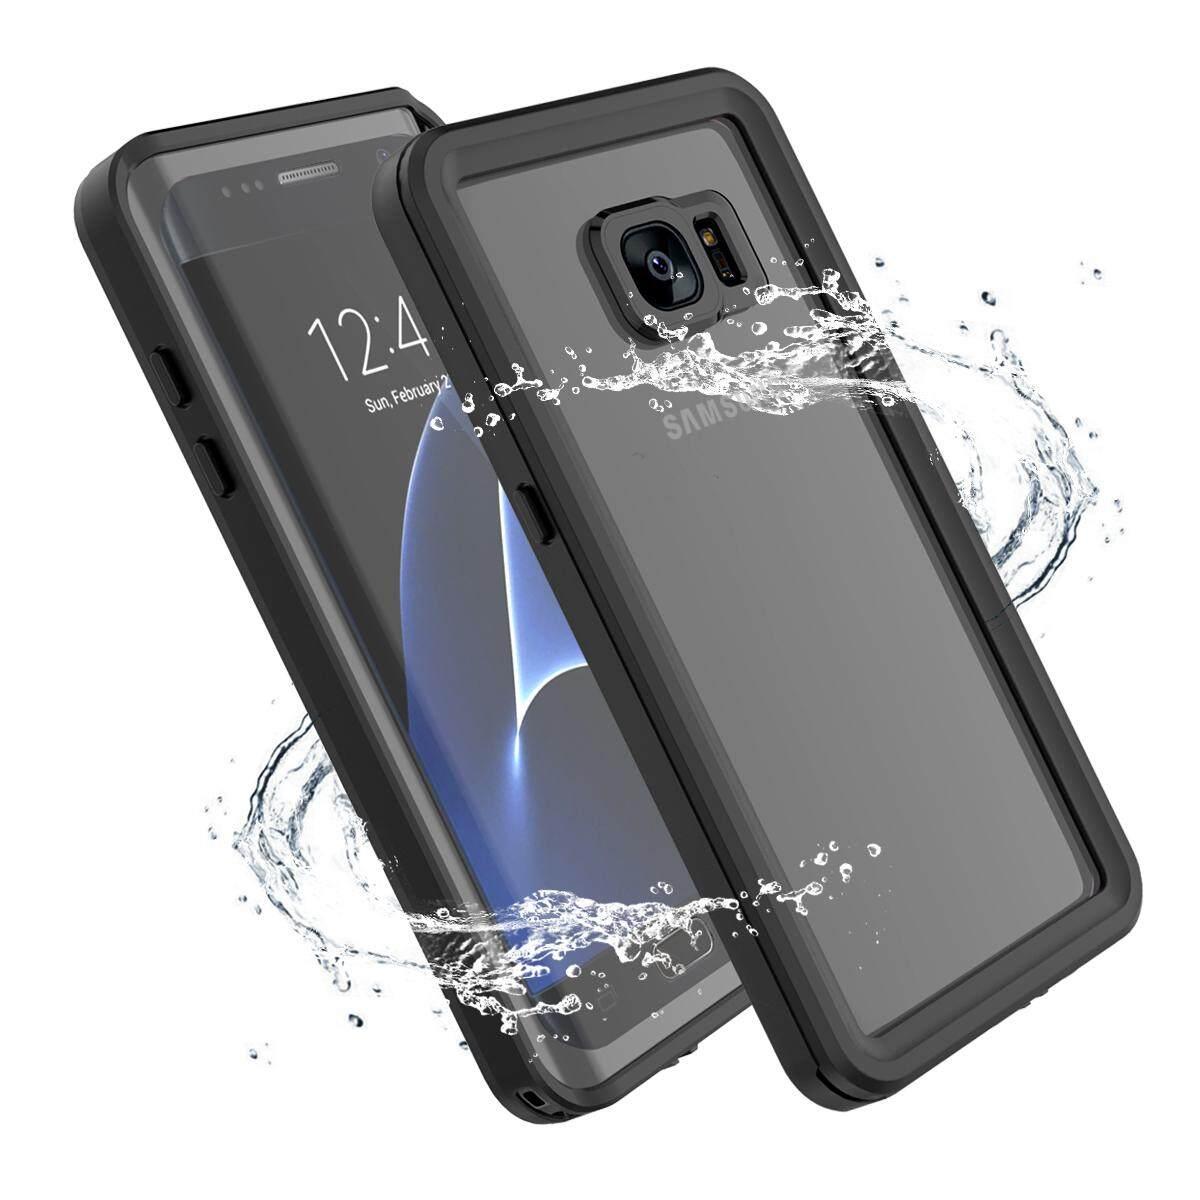 ... Moonmini For Samsung Galaxy S7 Edge Ultra-slim 360 Degree Protection Case Waterproof Dustproof Shell ...